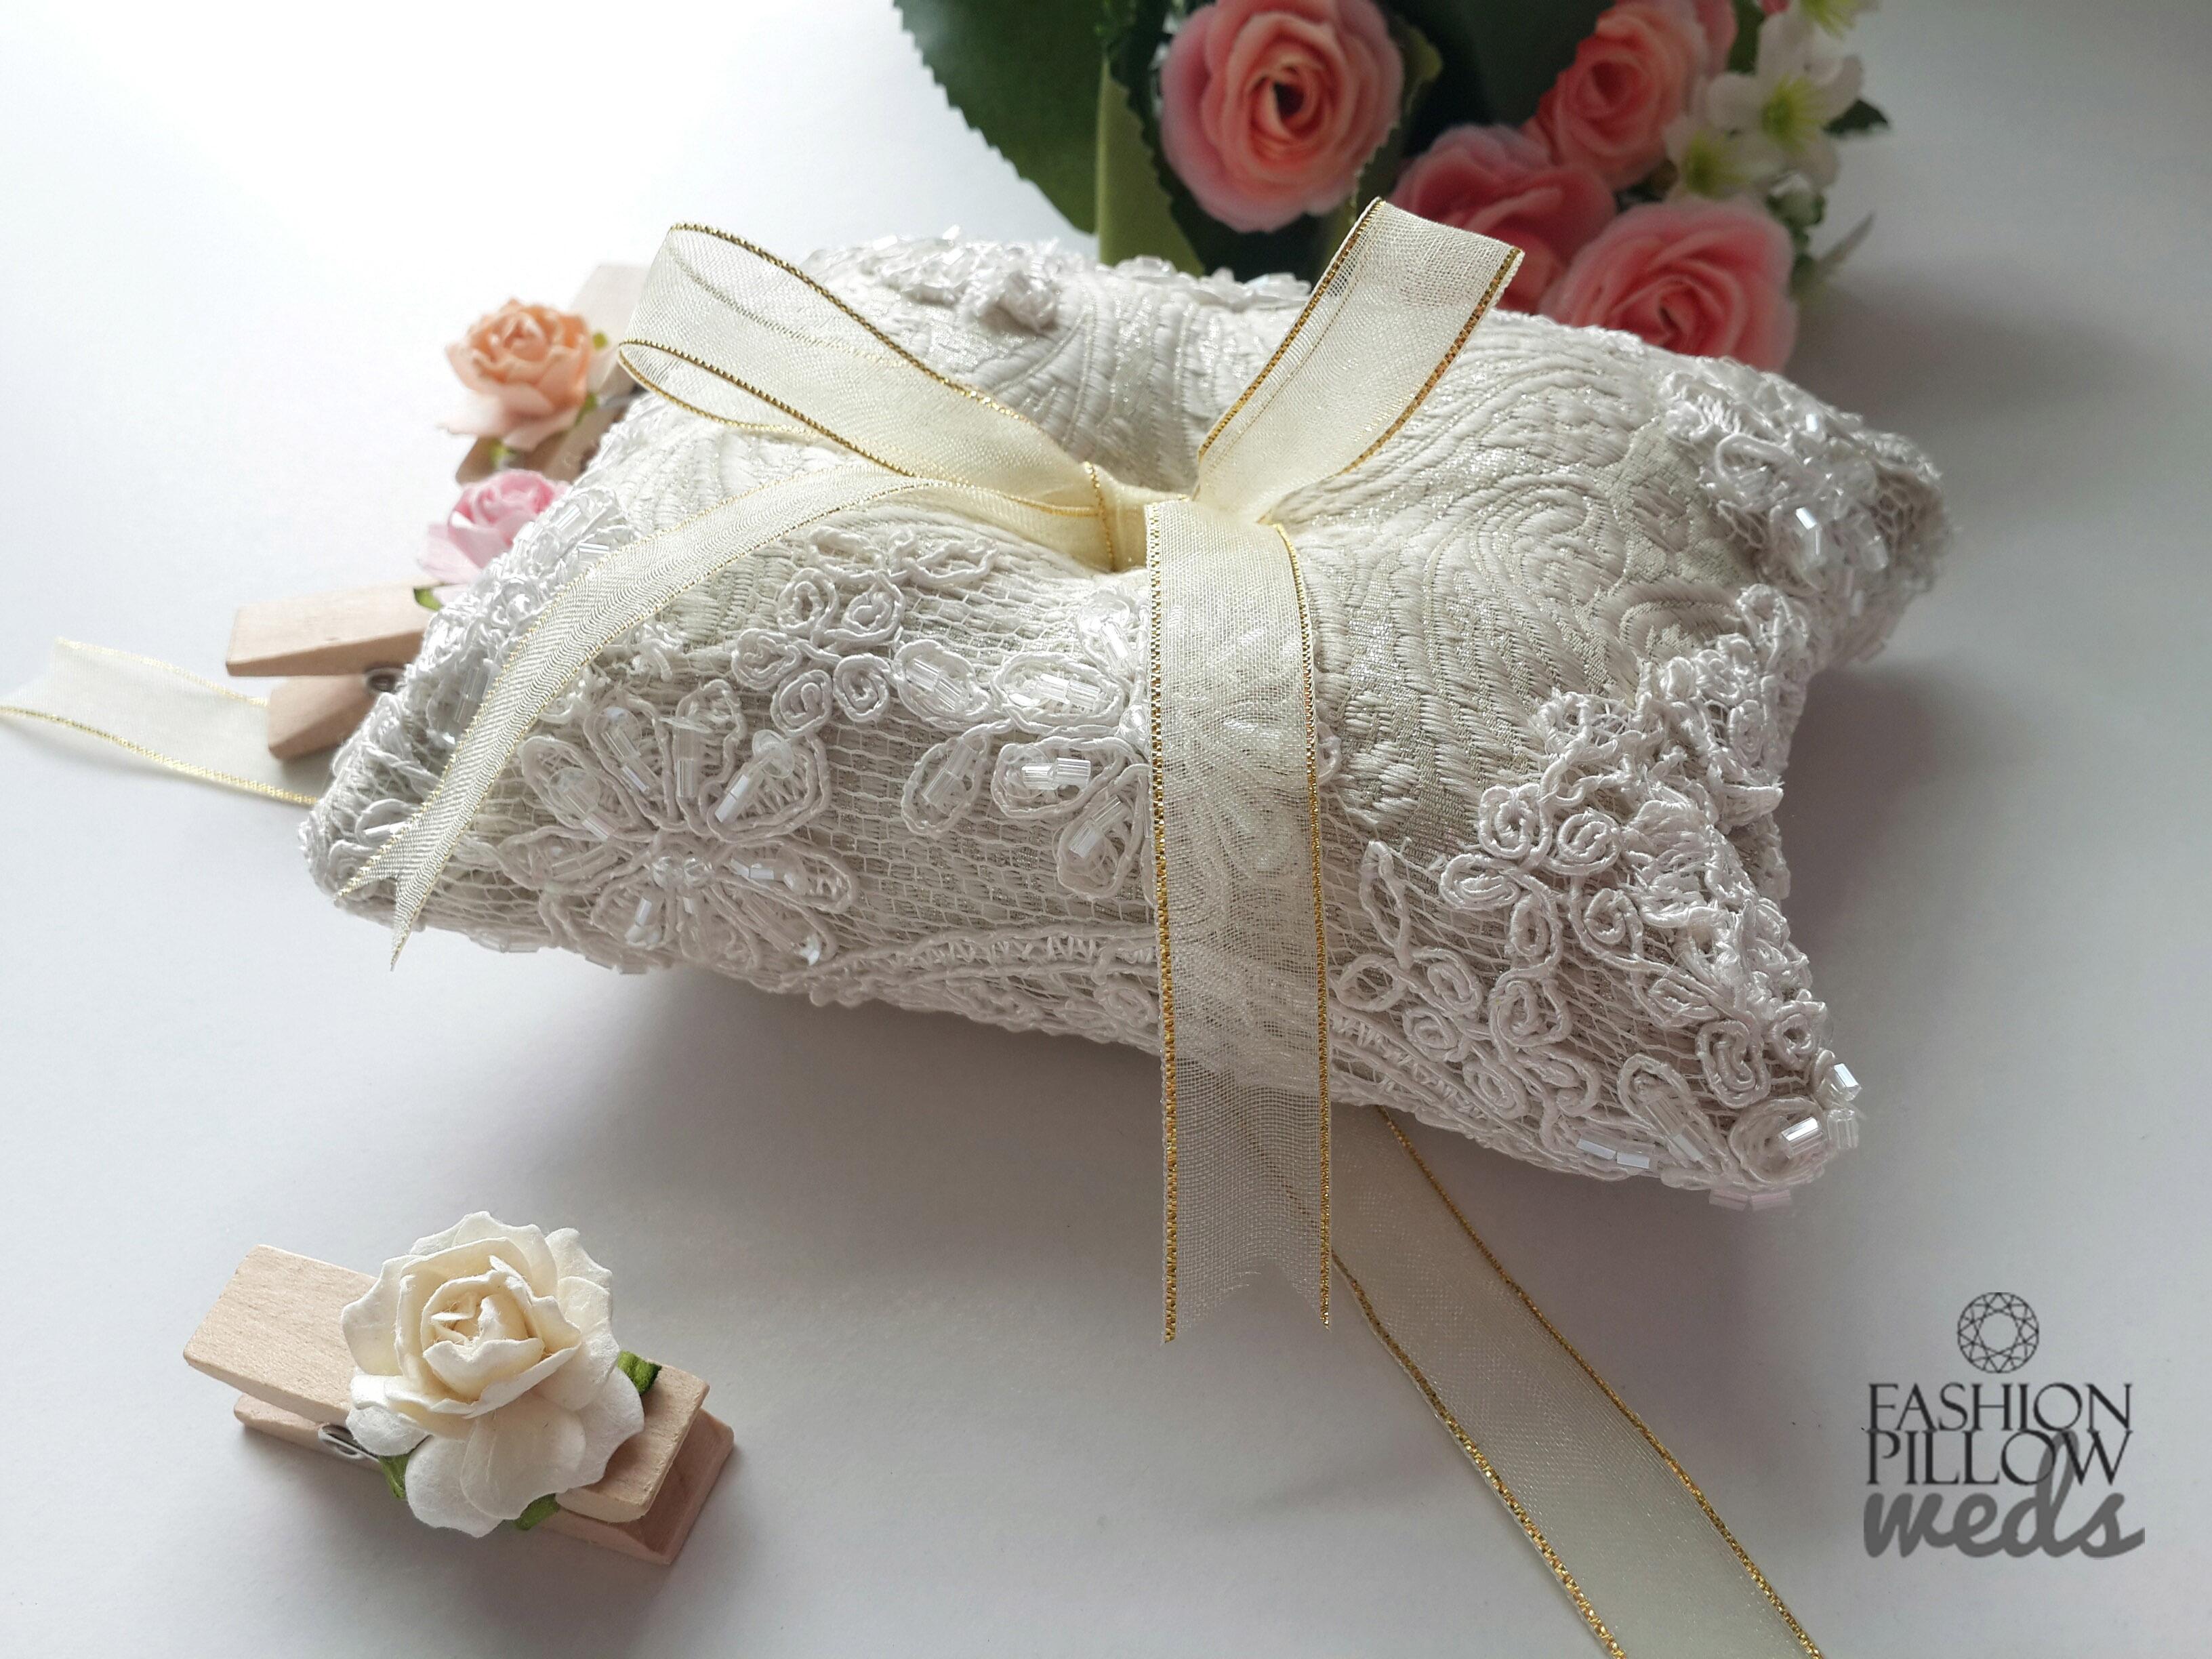 gallery burlap wedding blanket styles make ideas diy pillow ring to how beautiful cushion